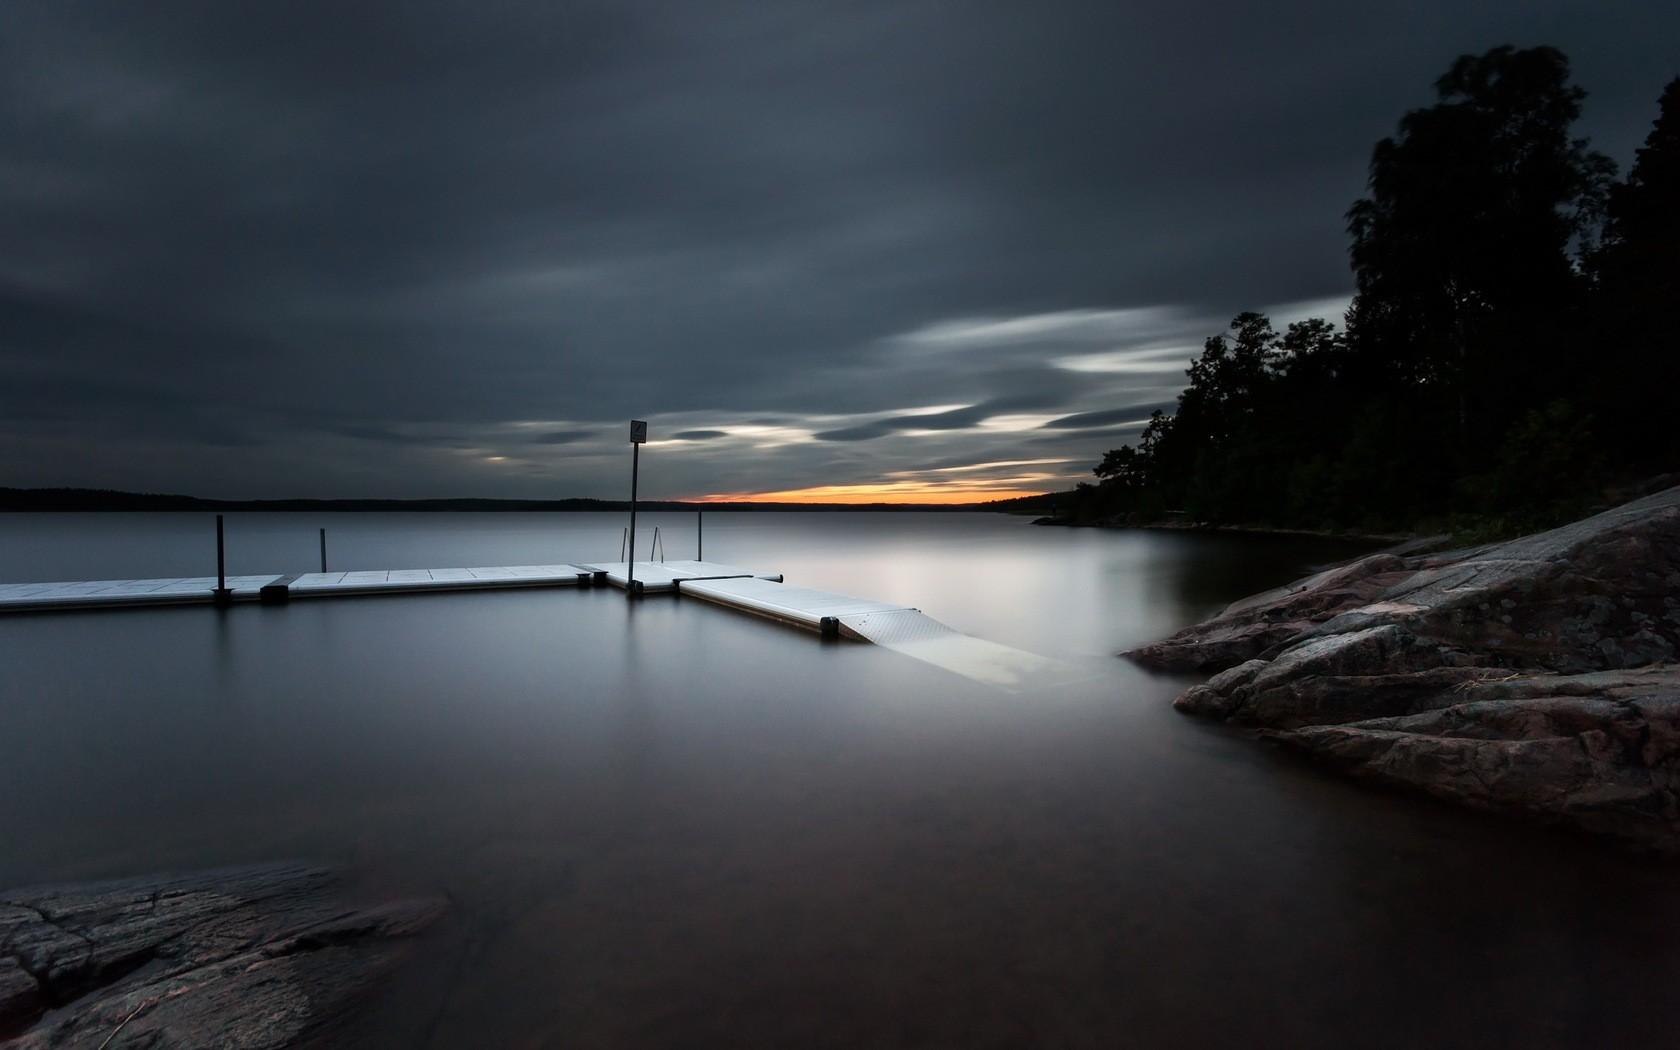 General 1680x1050 pier overcast landscape lake dusk